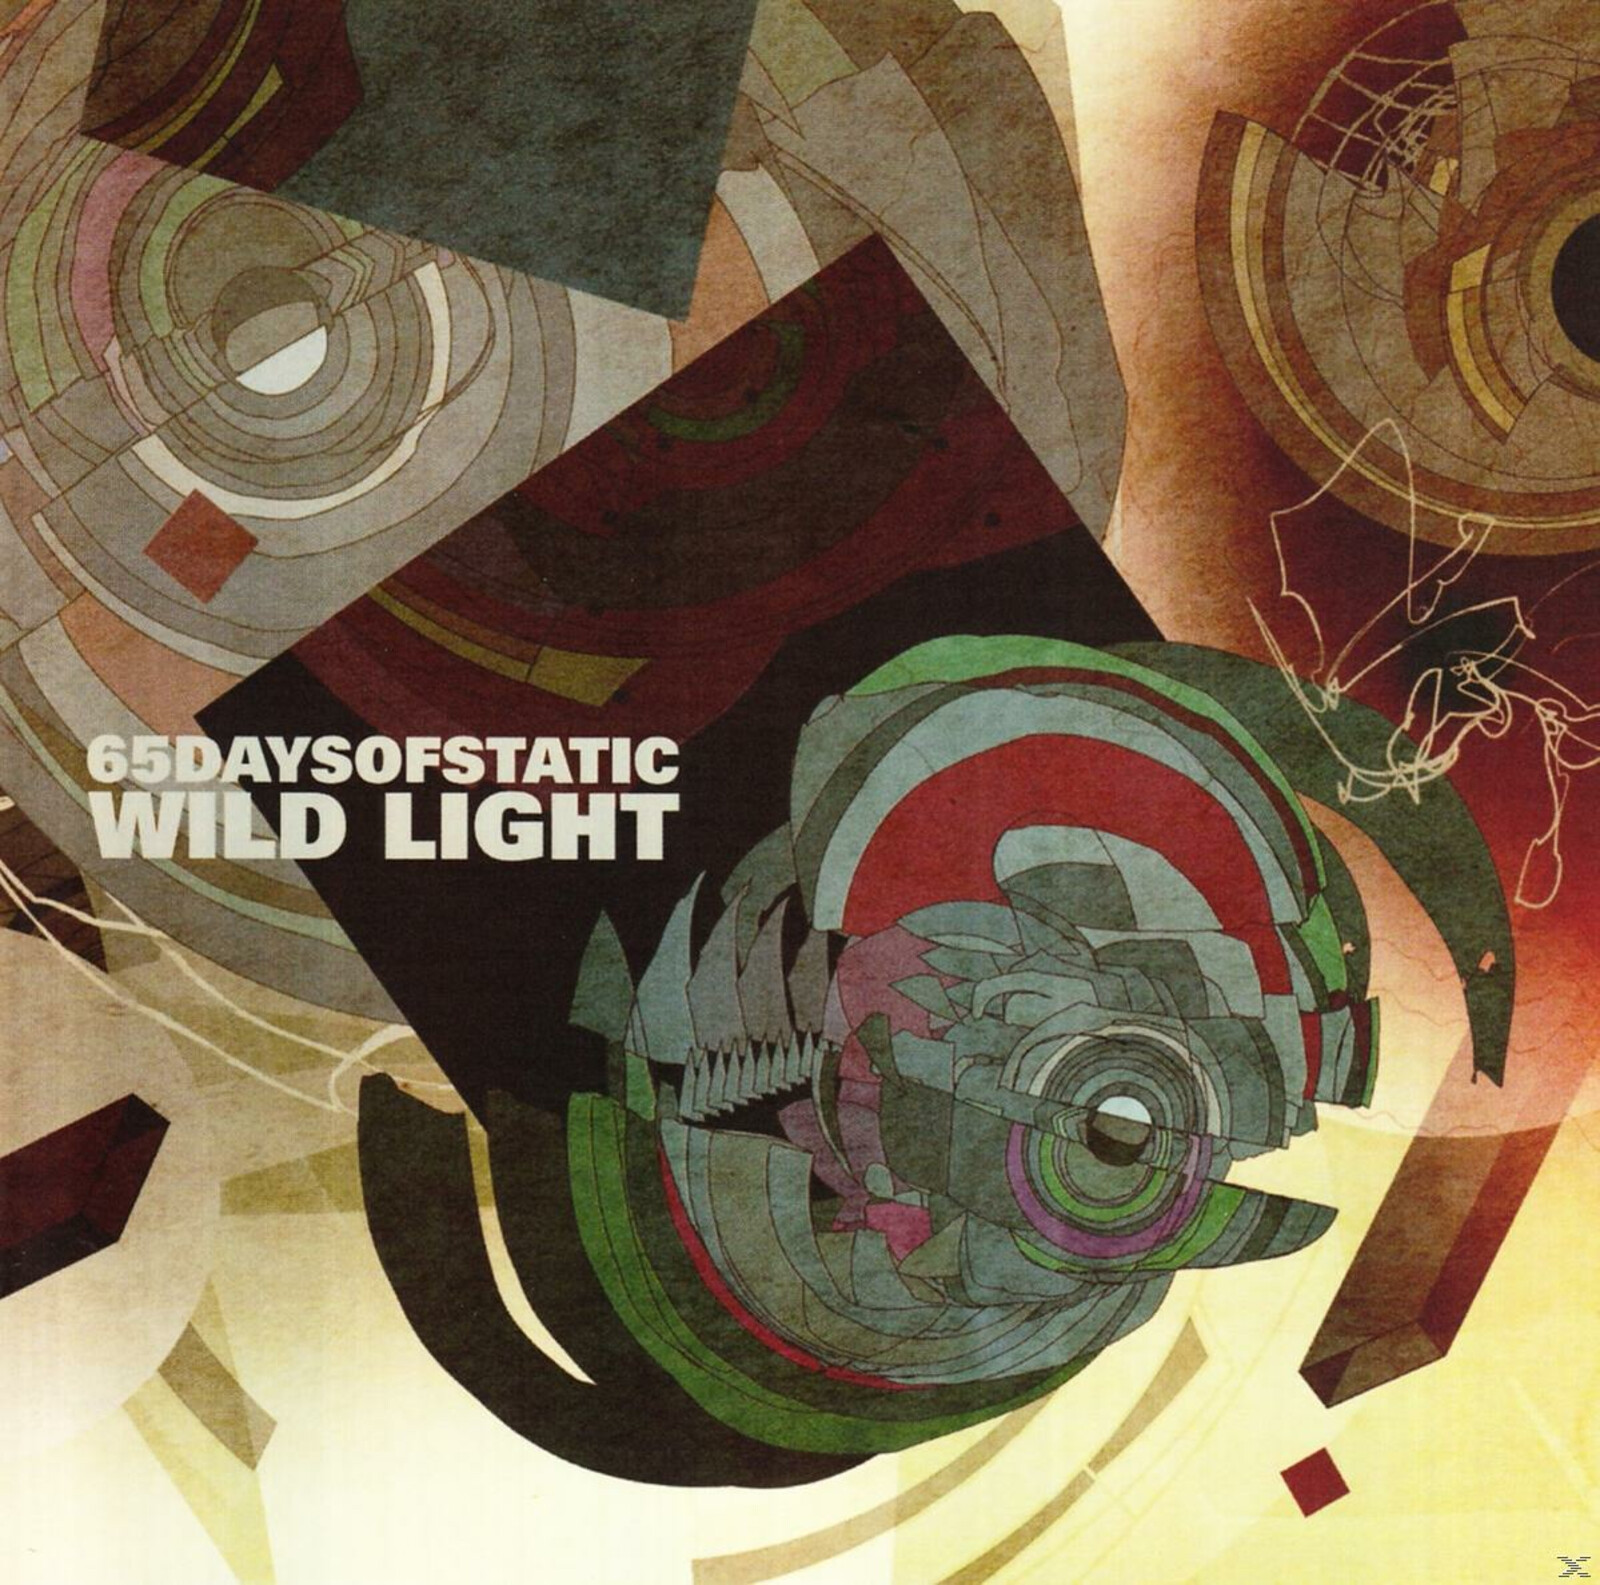 65daysofstatic - WILD LIGHT - (CD)